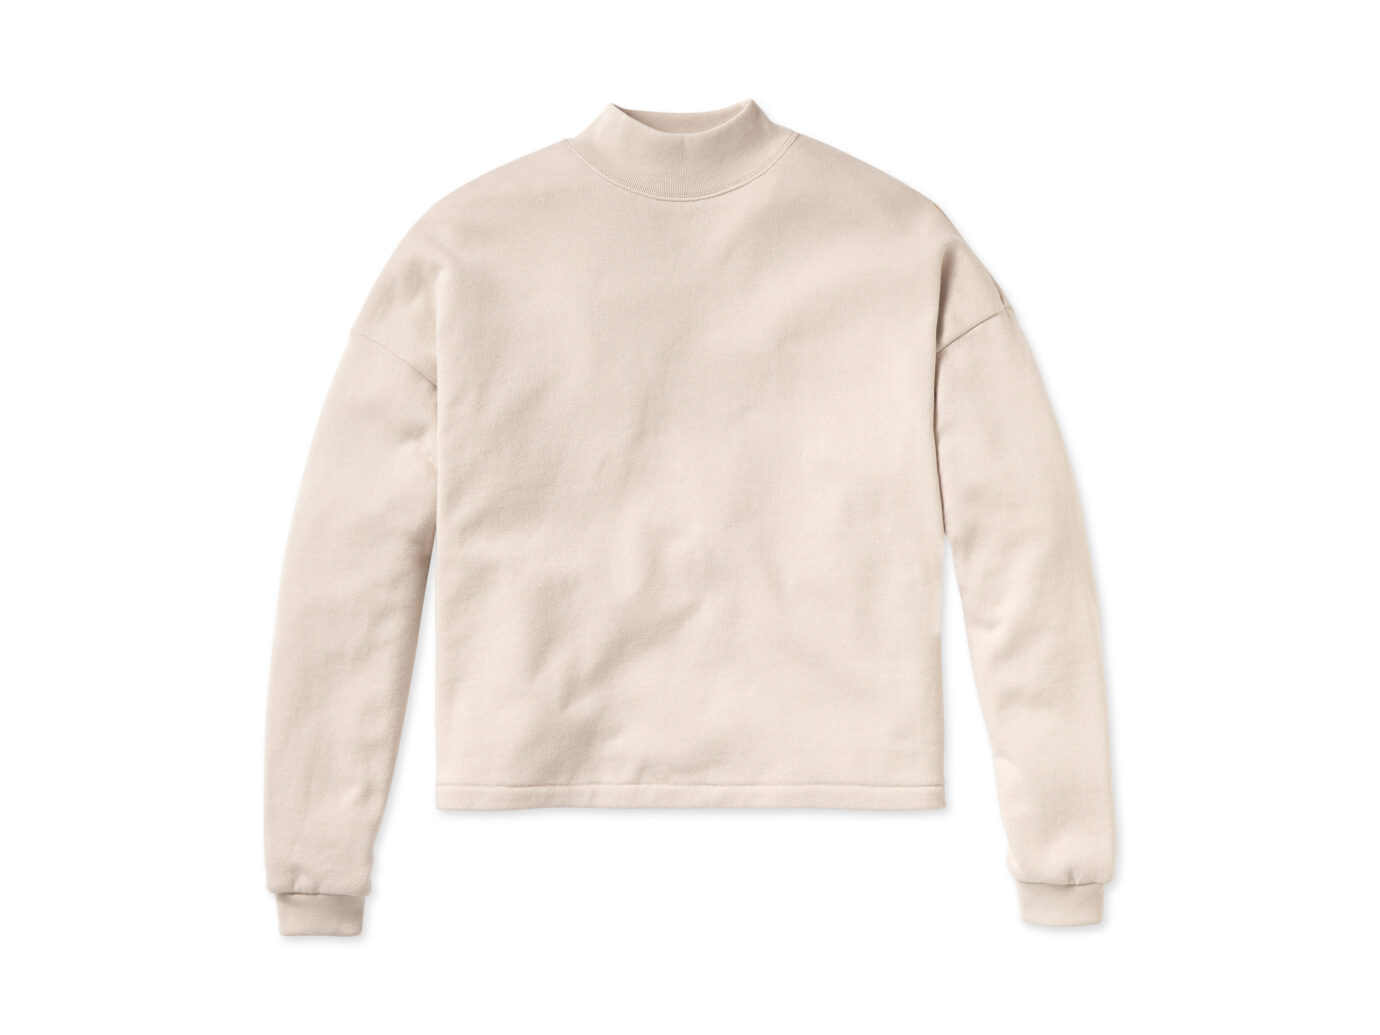 Entireworld Mockish Delight Sweatshirt